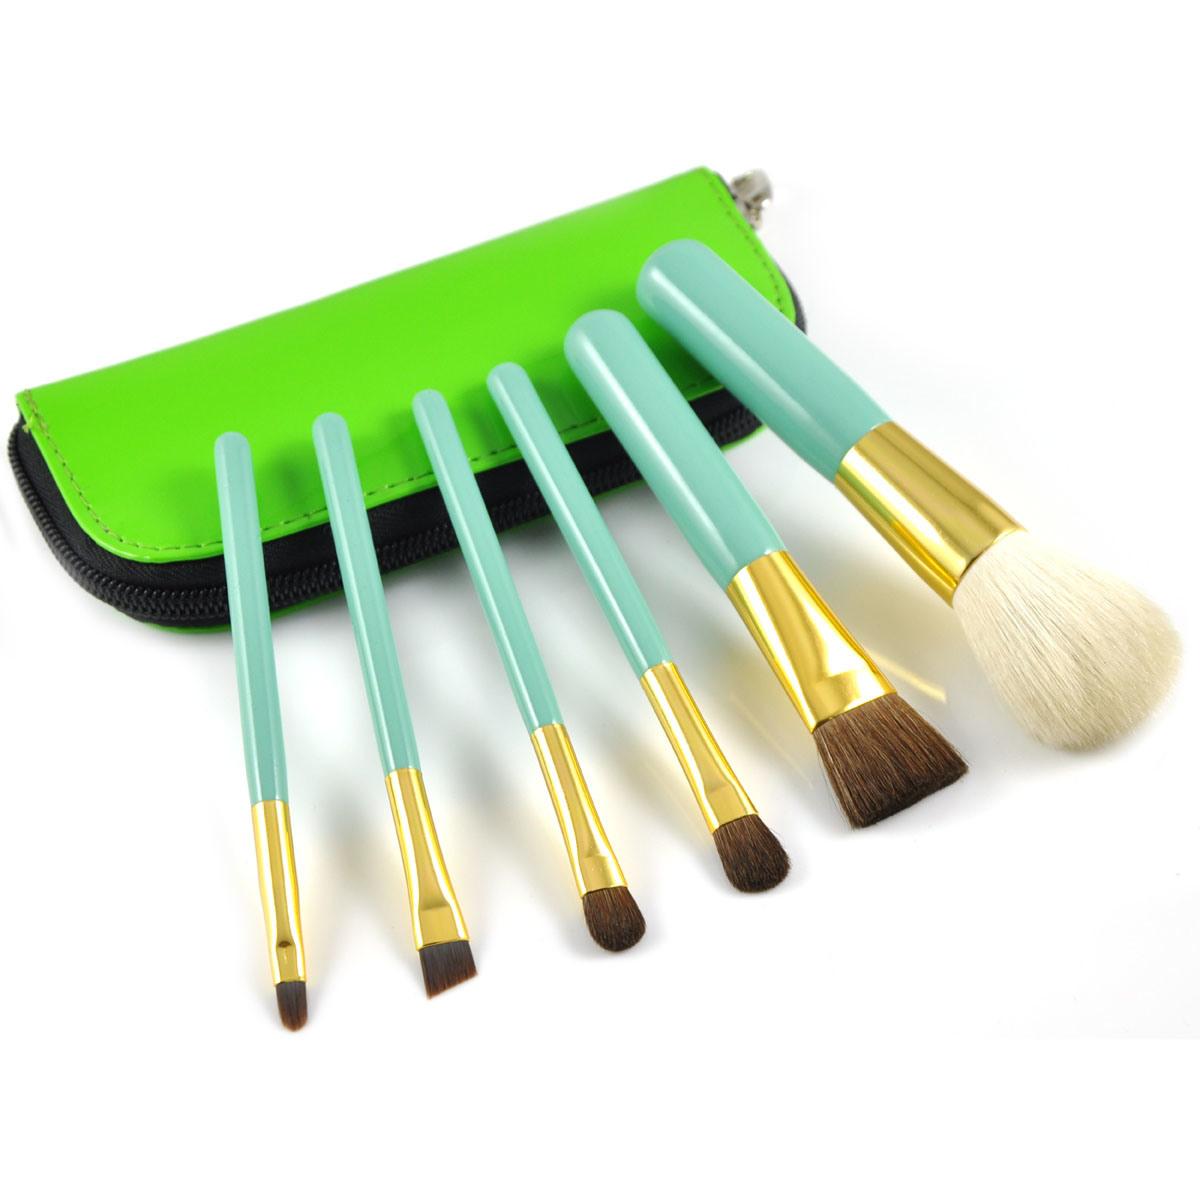 Shiny Color Portable Beauty Kits Makeup Brush Set